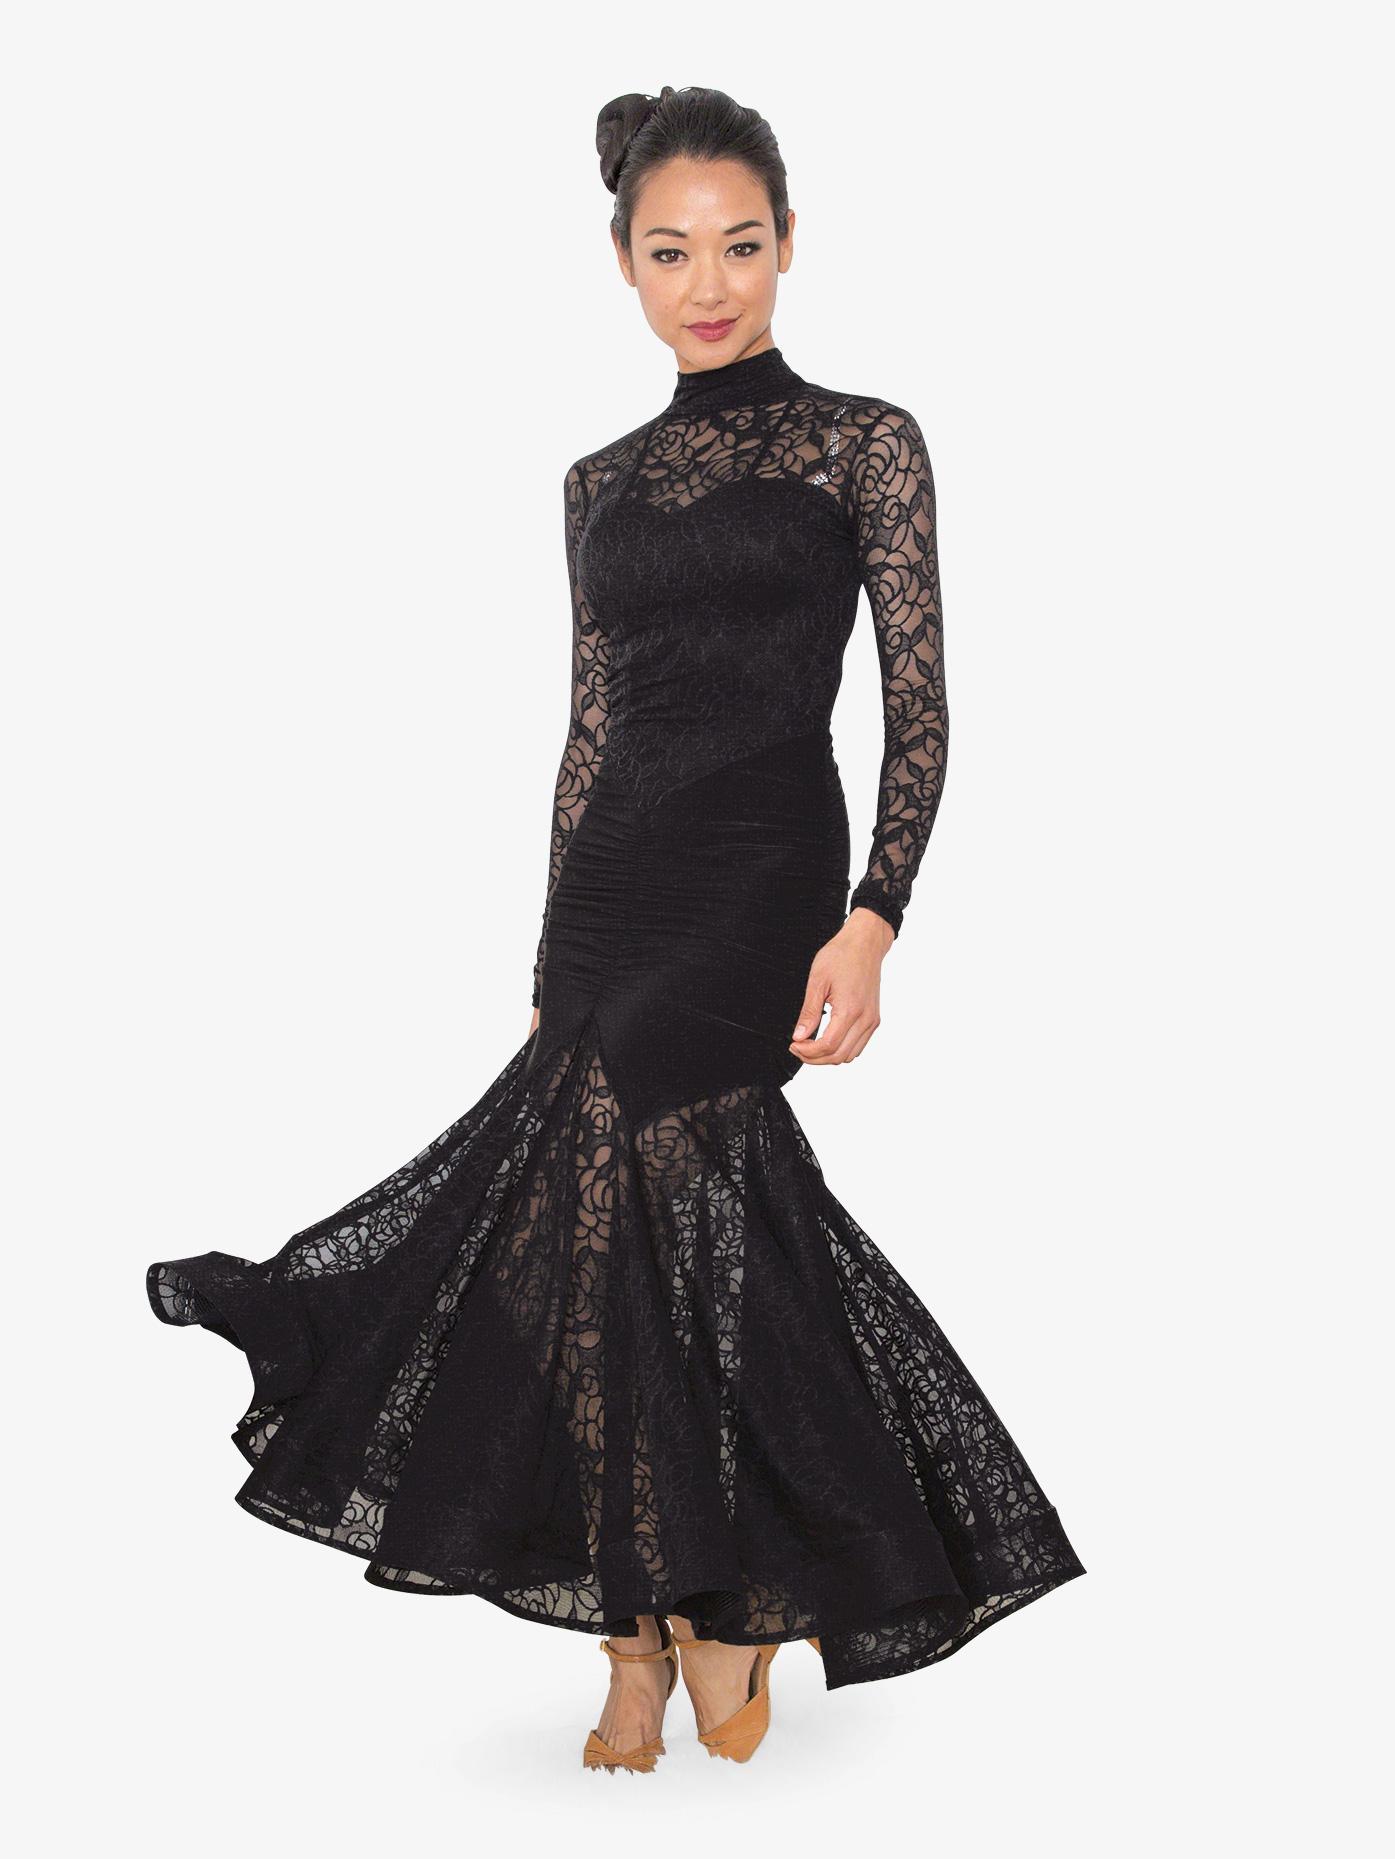 Angelica Long Ballroom Dance Dress Dresses Dance America D810